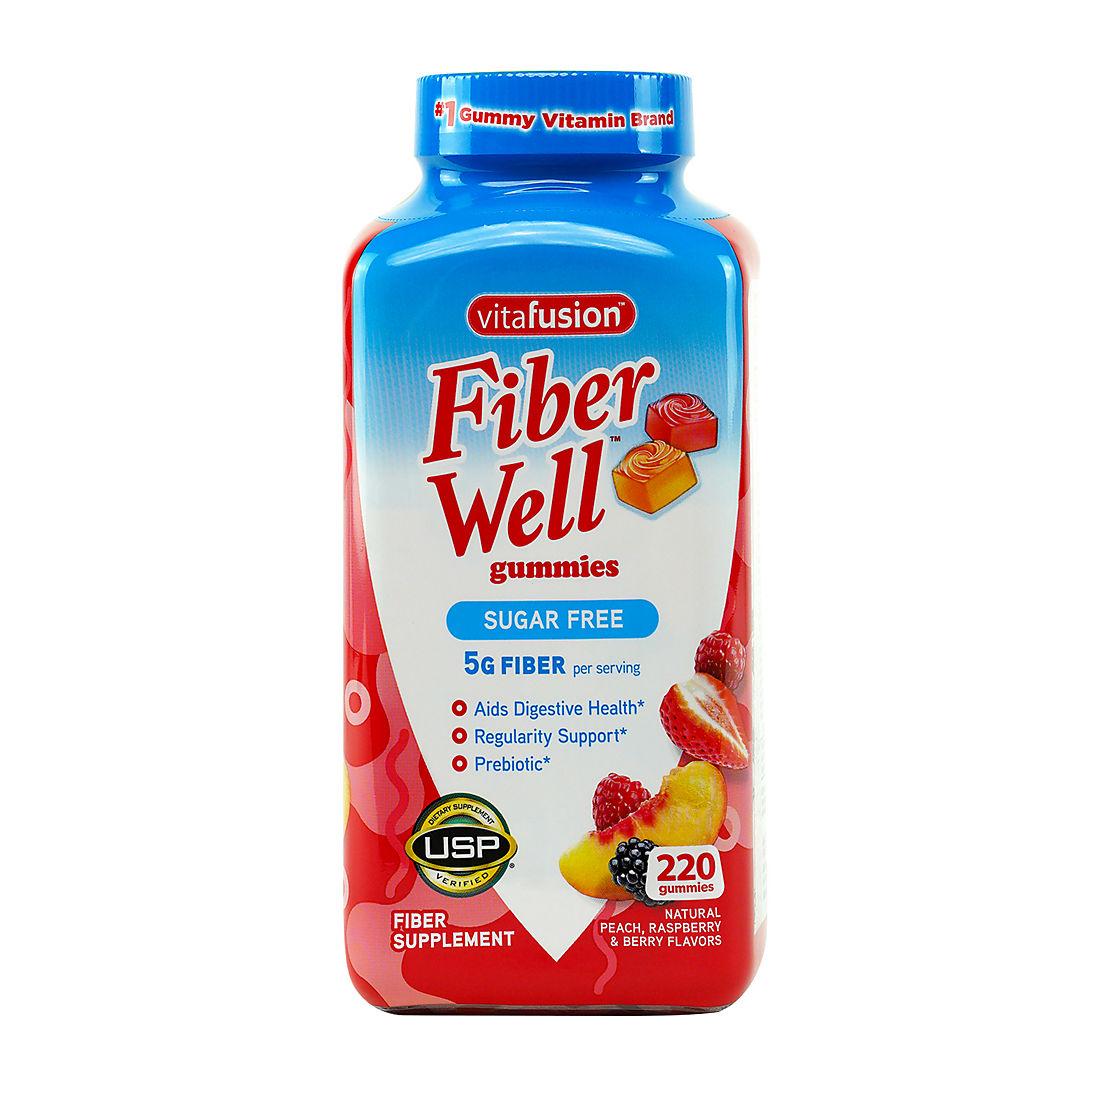 Vitafusion Fiber Gummies, 220 ct. - BJs